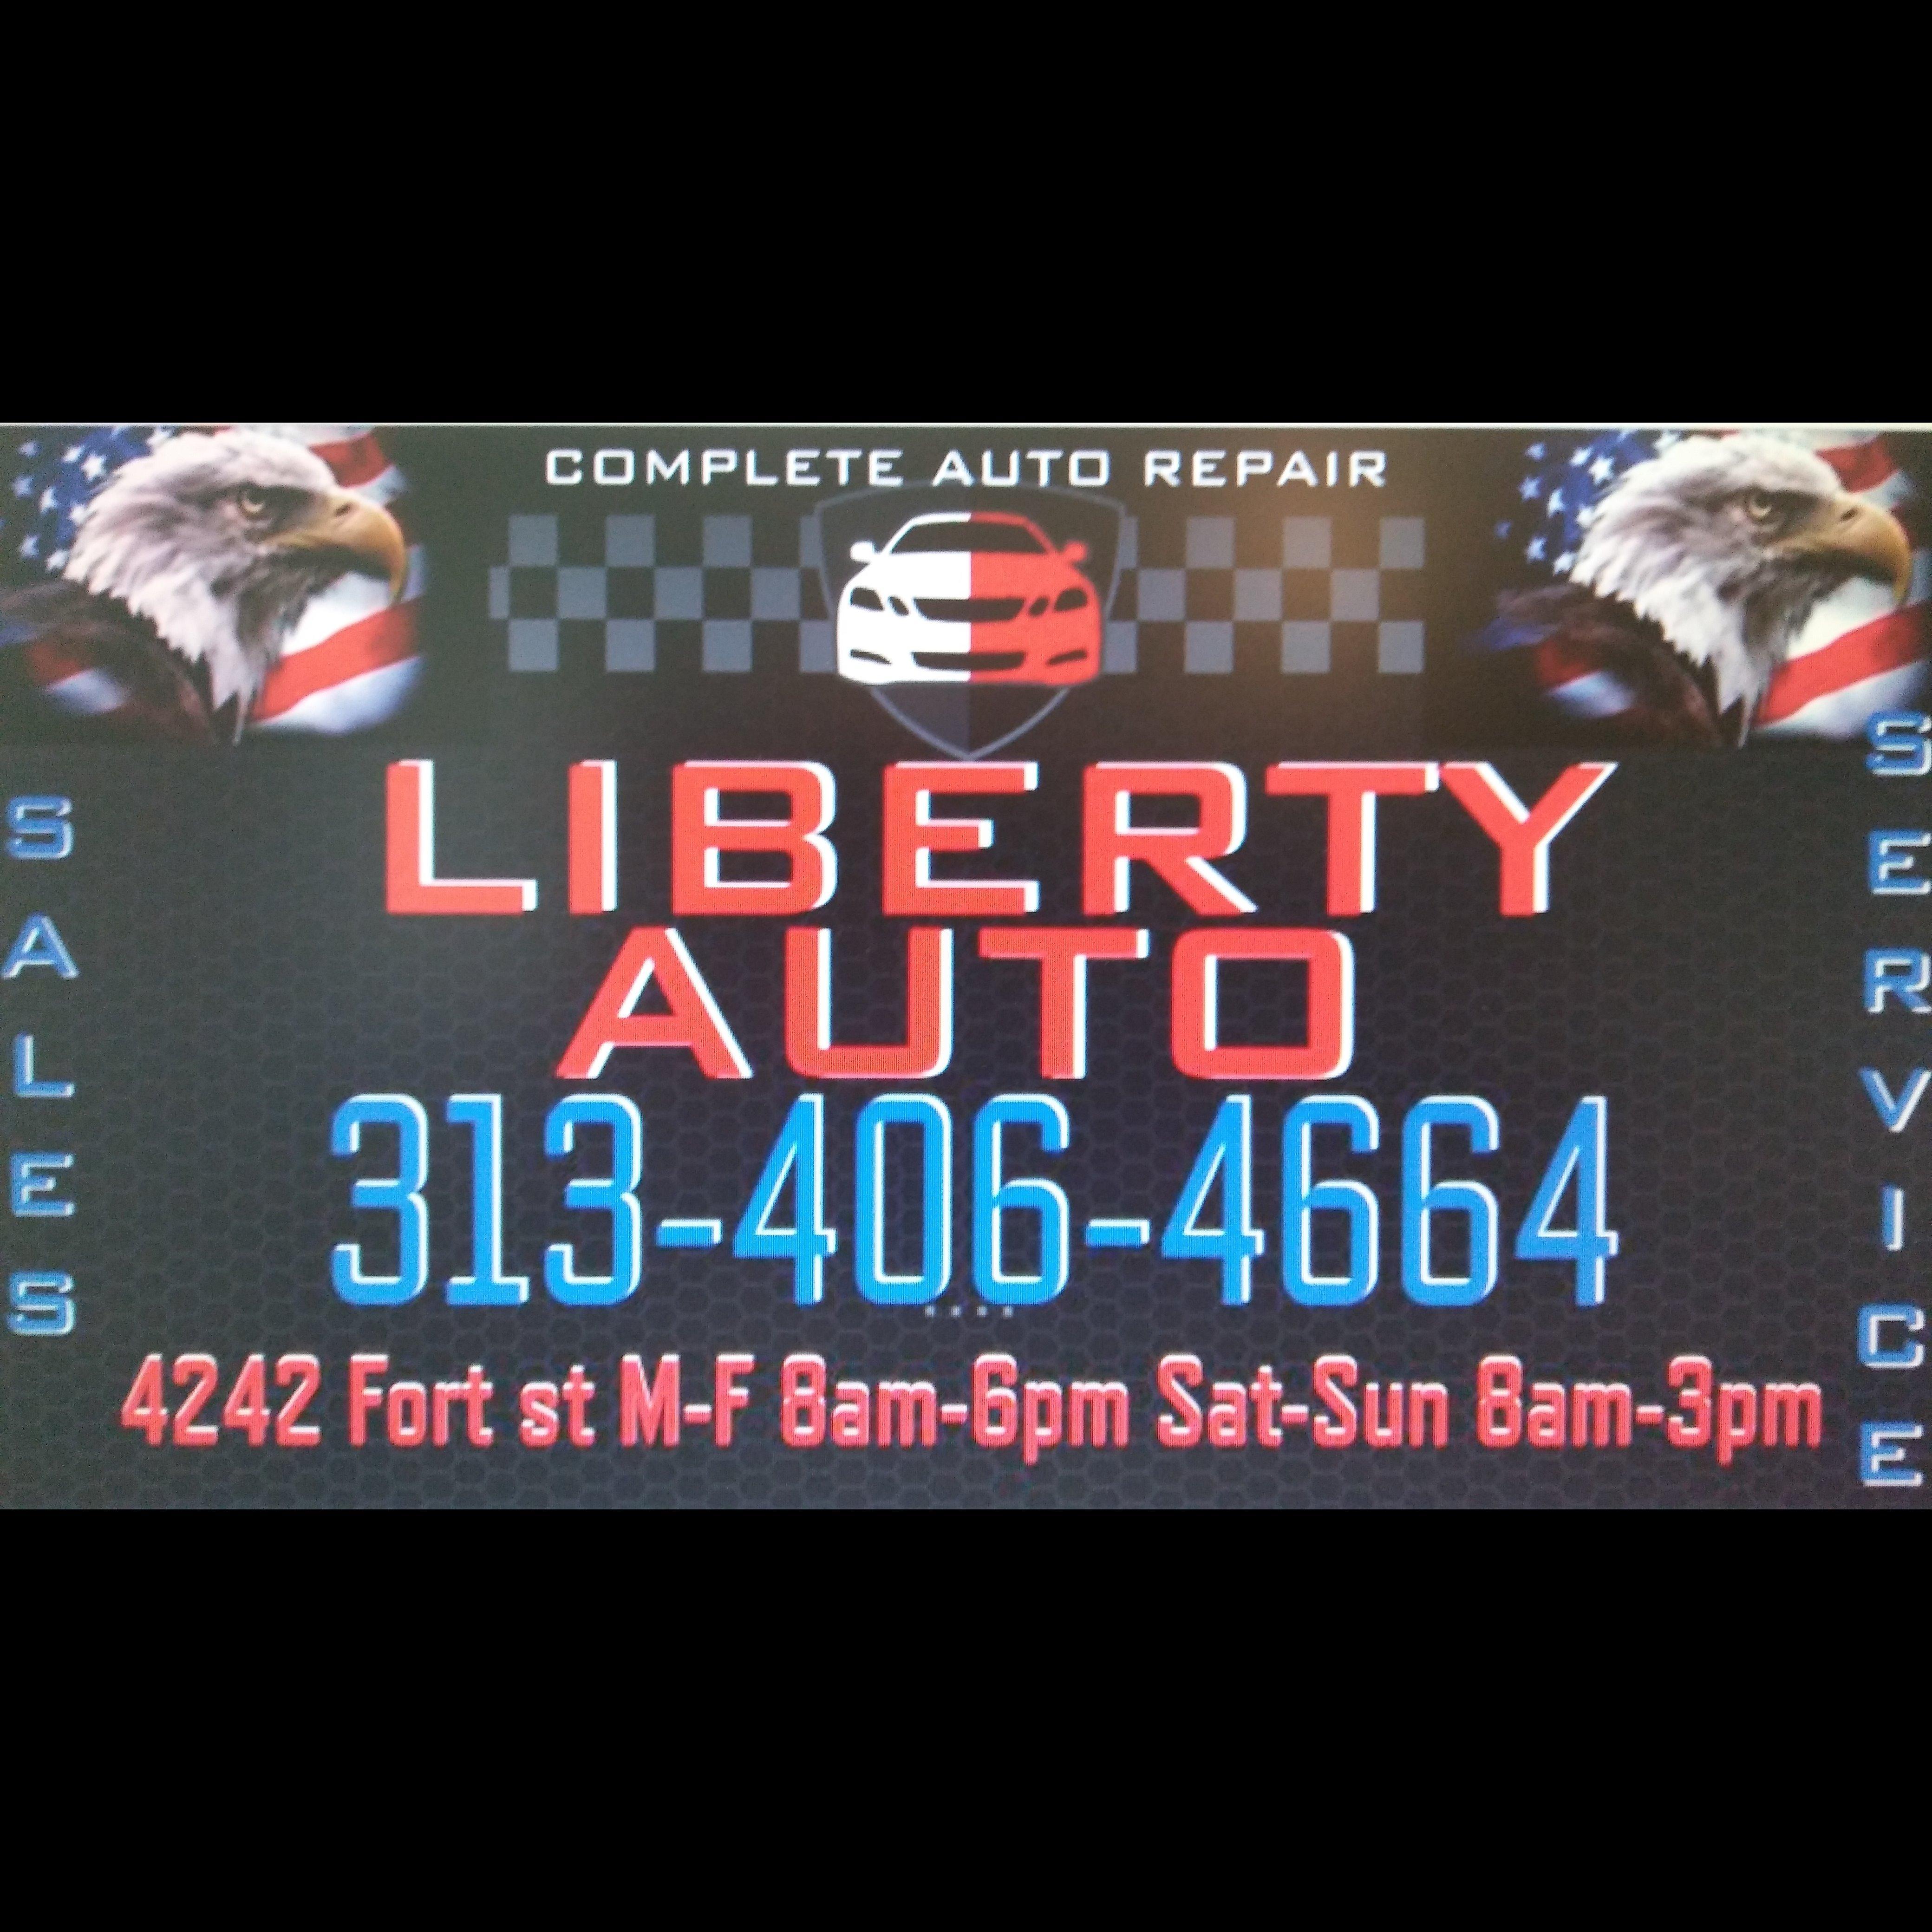 LIBERTY AUTO SALES AND SERVICE LLC image 5